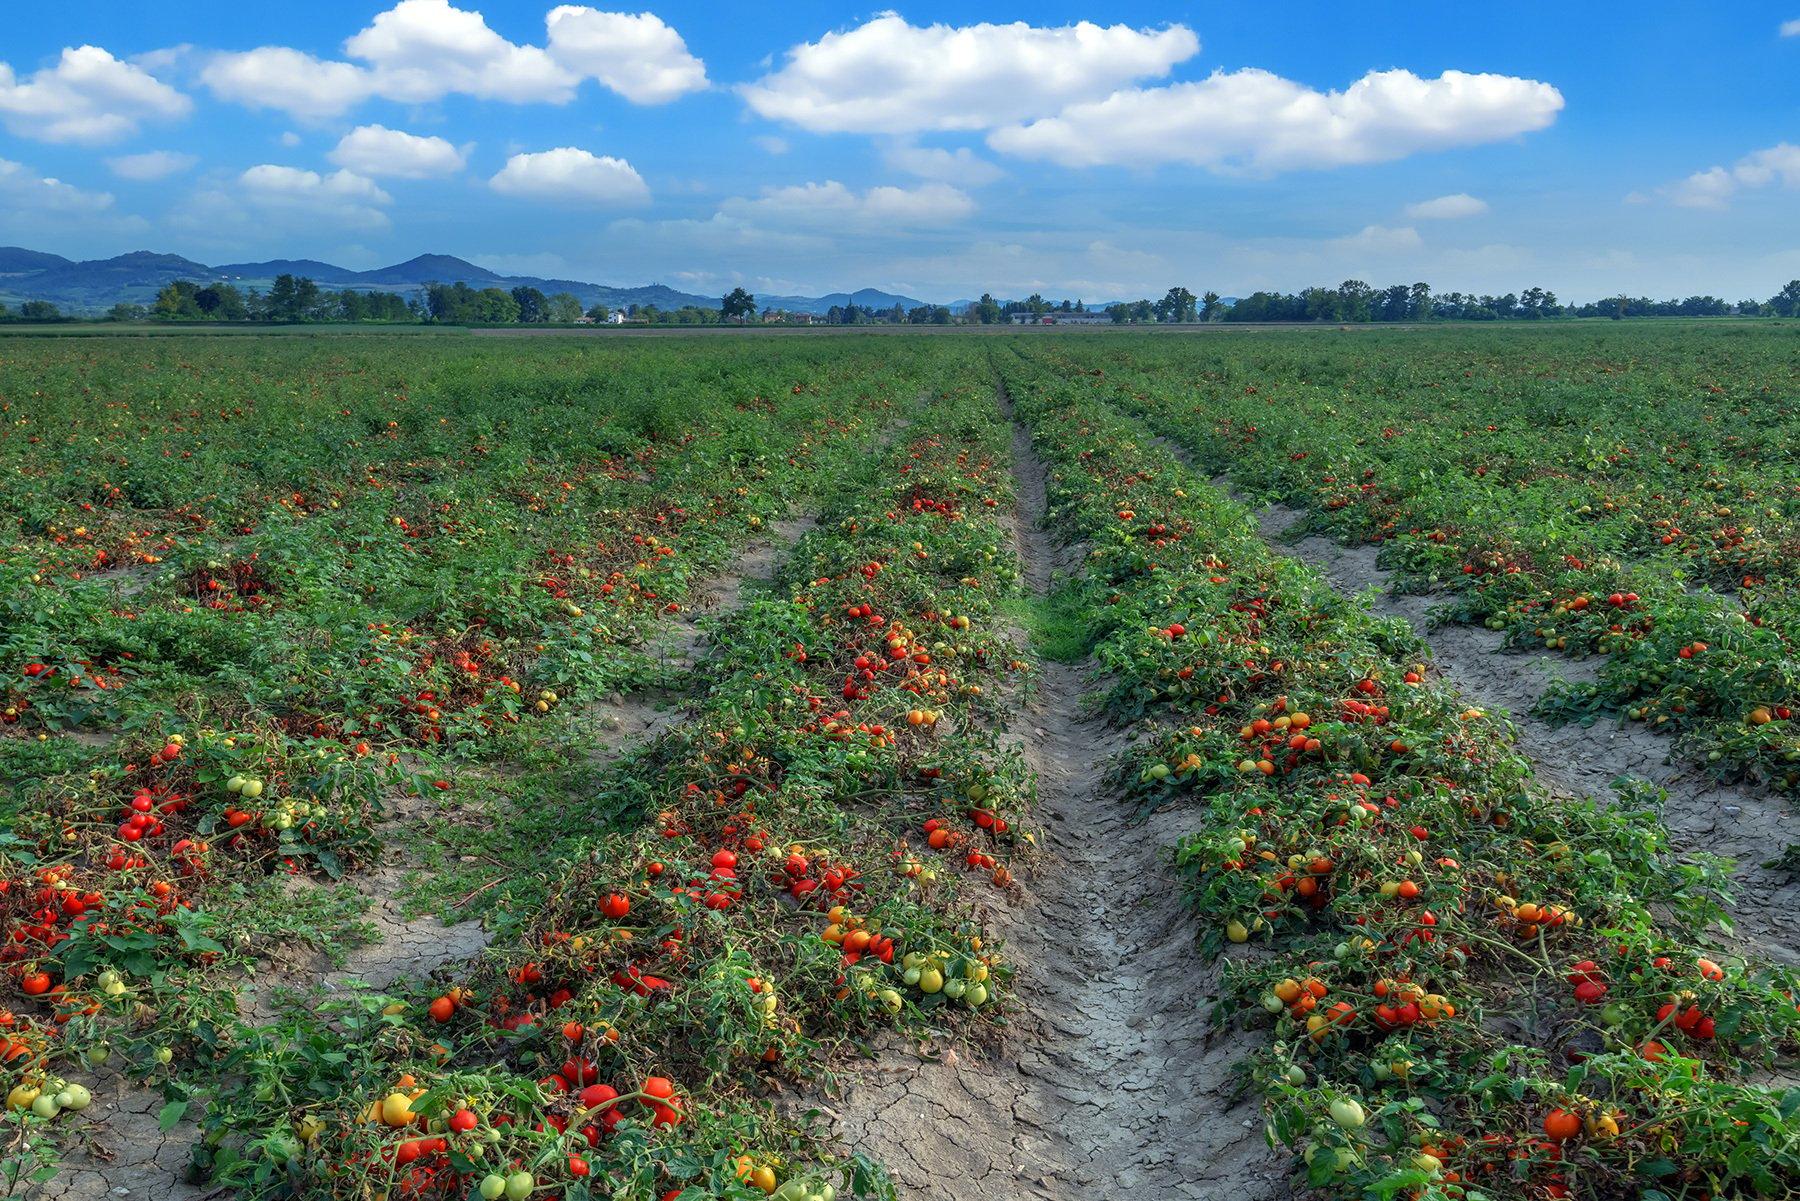 certis-LG-tomato-field